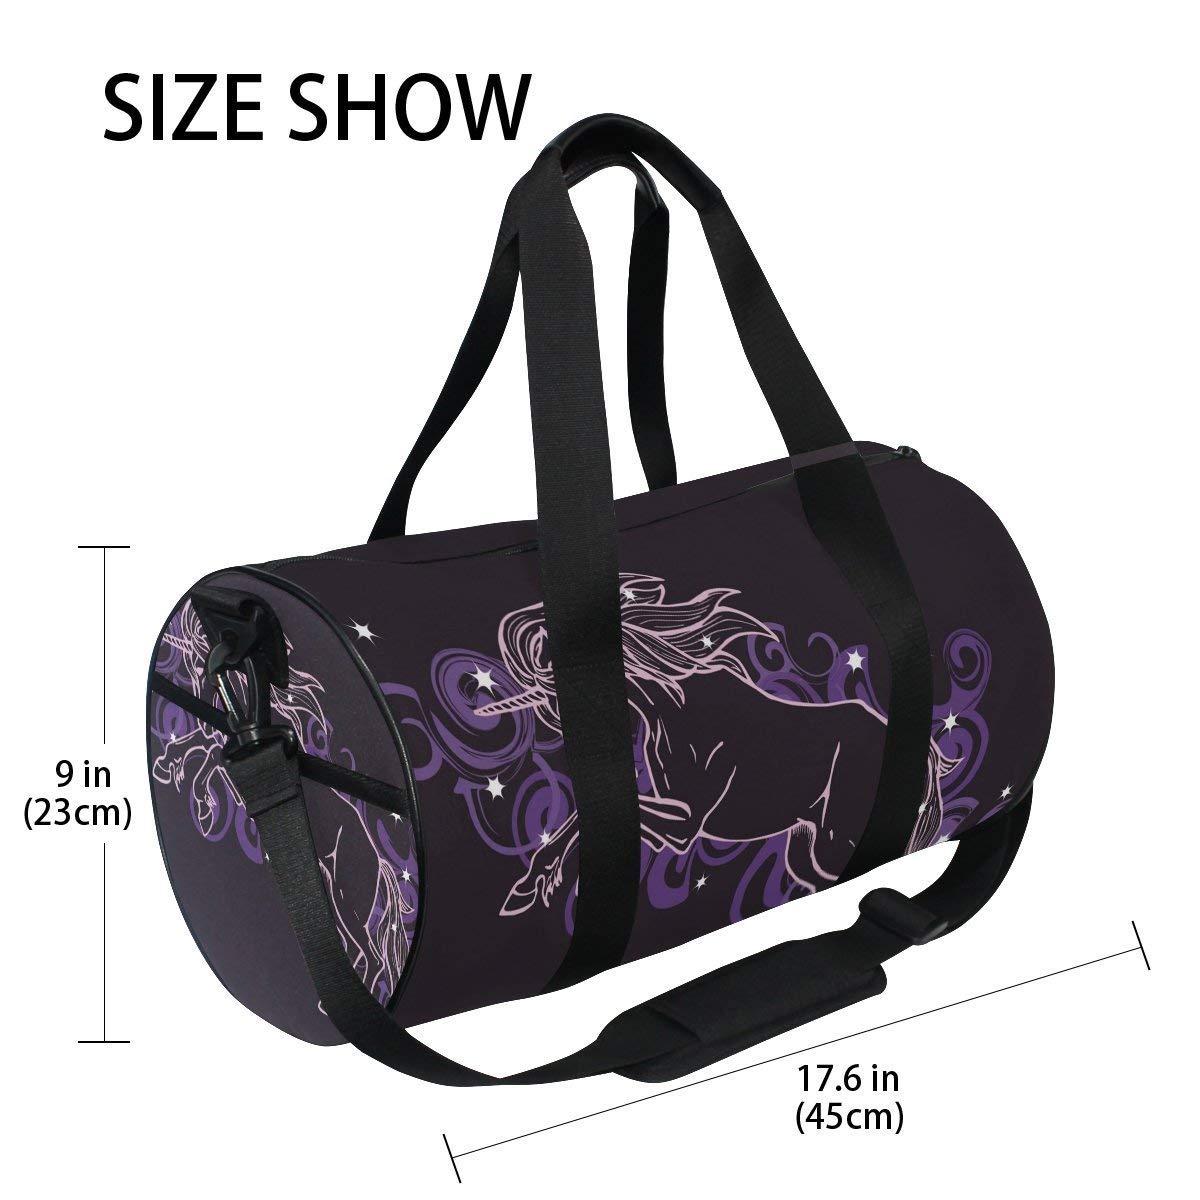 Gym Duffel Bag Unicorn Star Cloud Sports Lightweight Canvas Travel Luggage Bag by KMAND (Image #4)